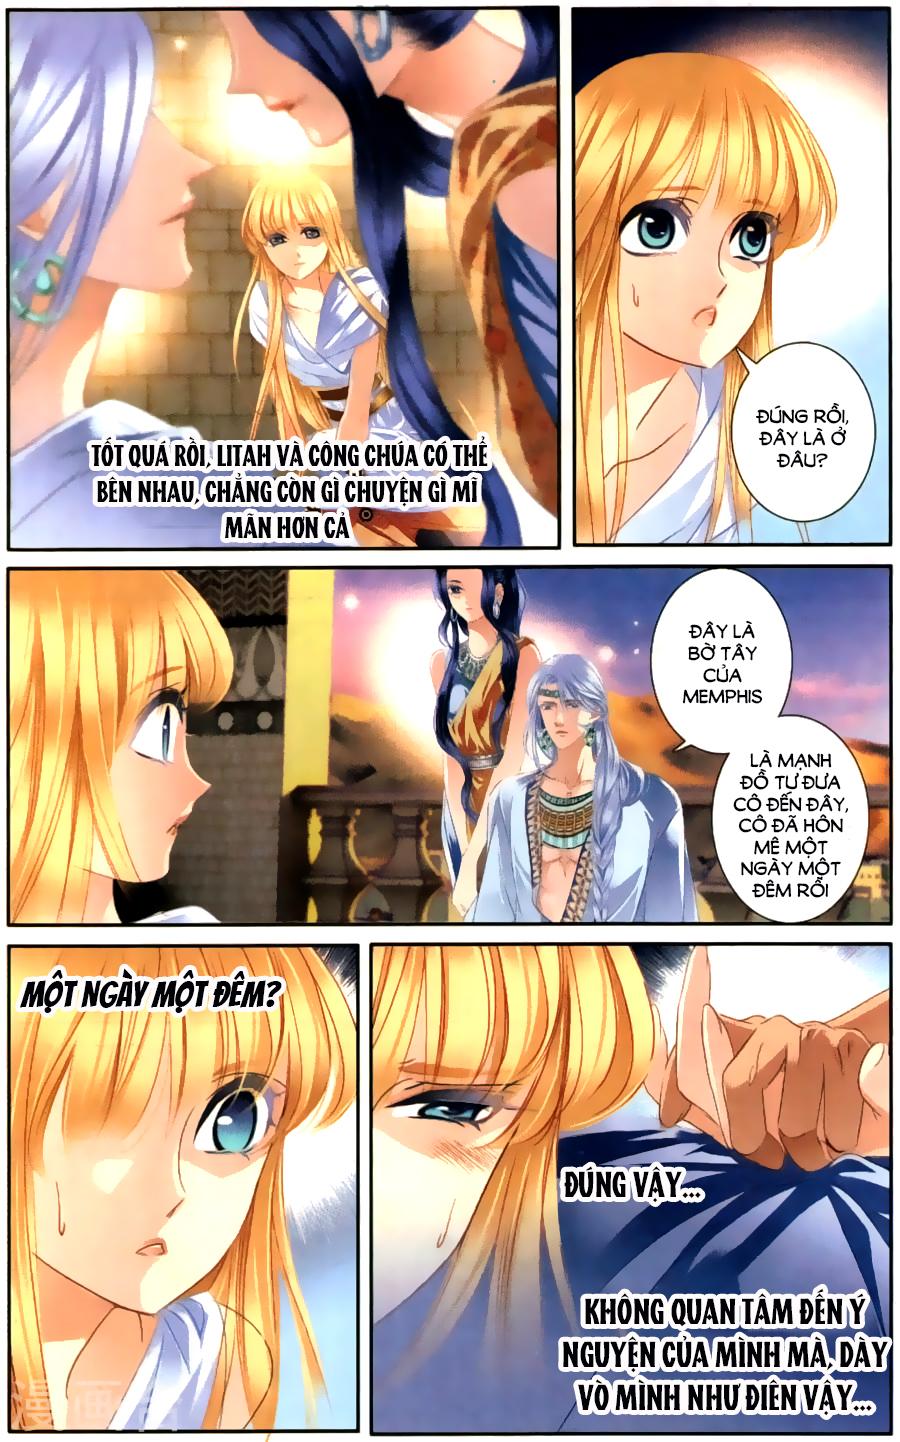 Sủng Phi Của Pharaoh chap 61 - Trang 12